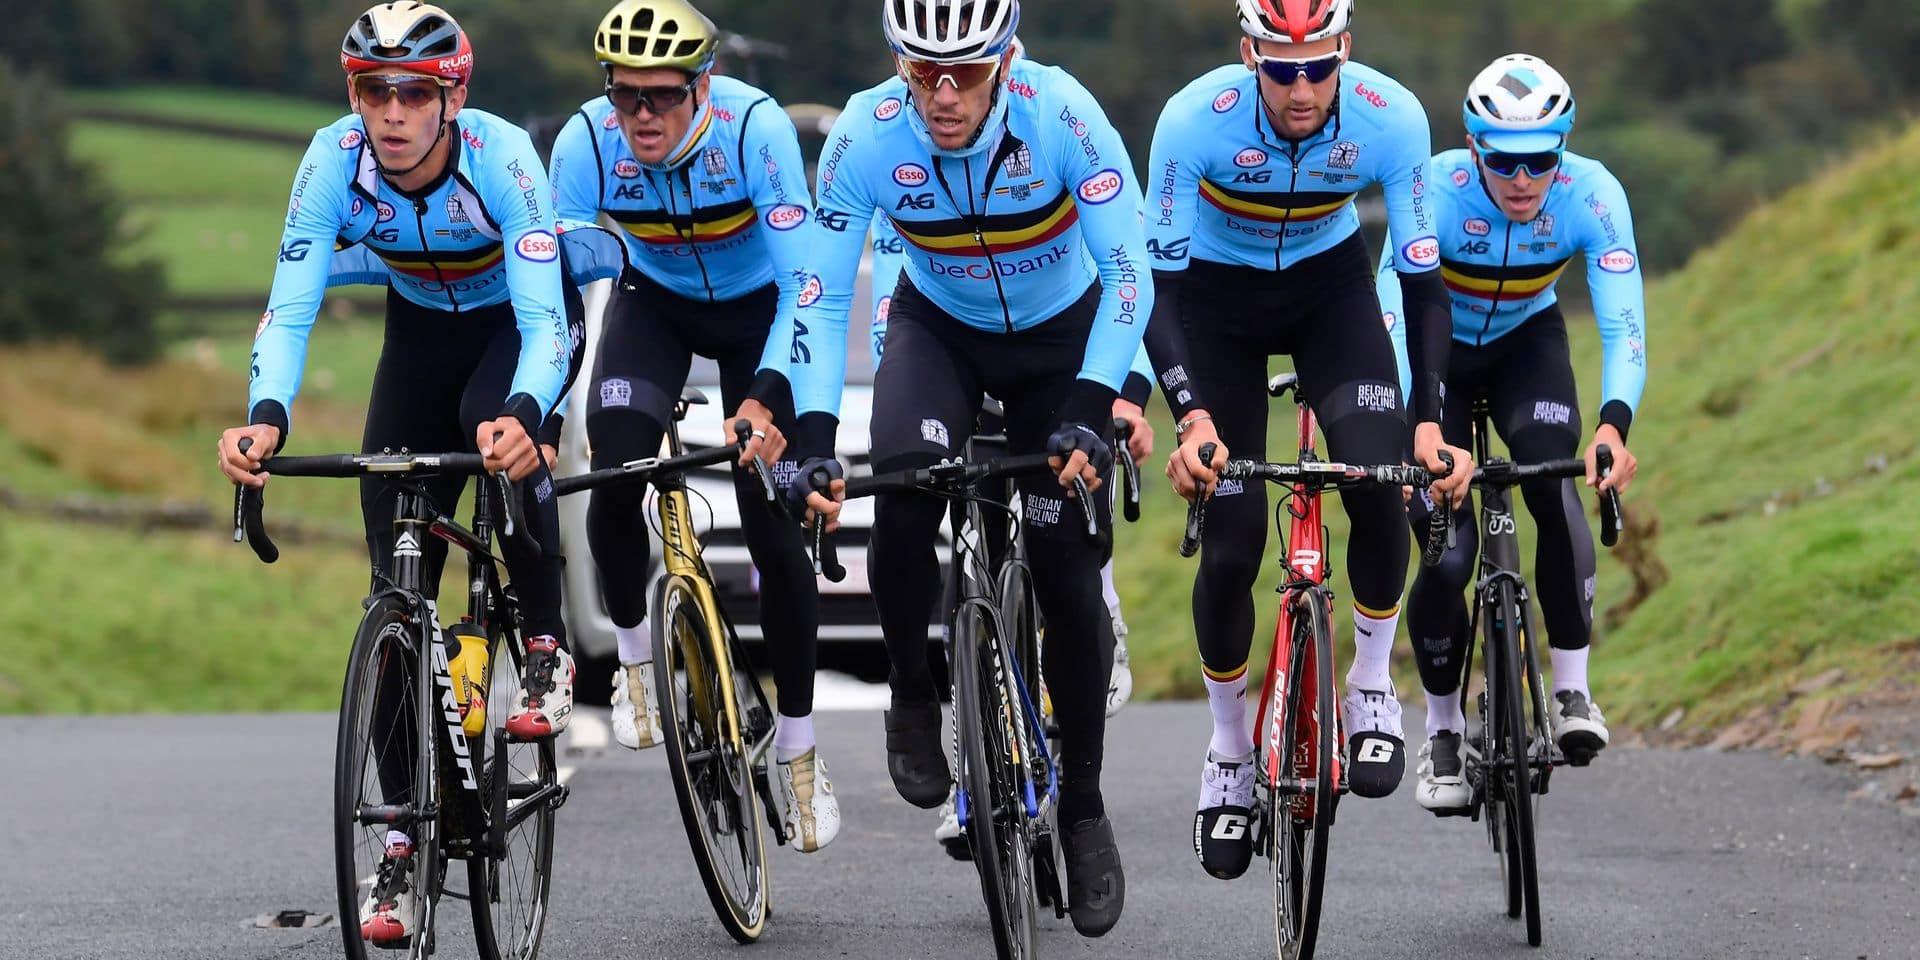 2019 UCI World Road Championships - 25/09/2019